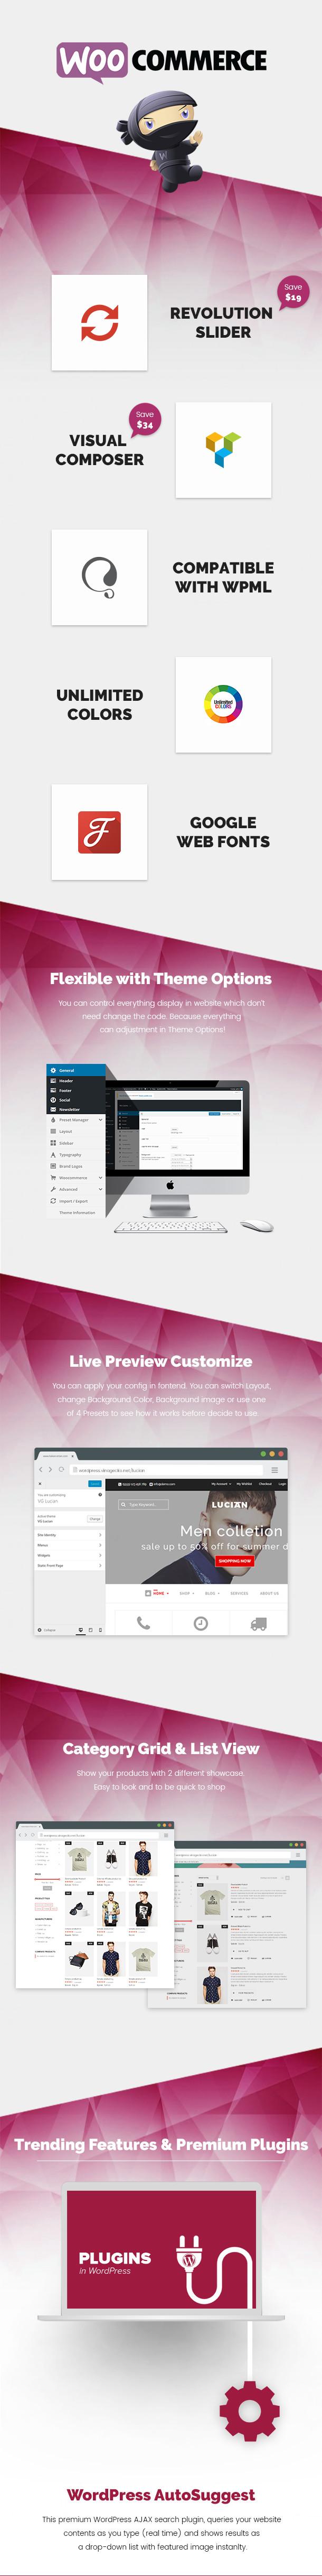 VG Lucian - Responsive eCommerce WordPress Theme - 32